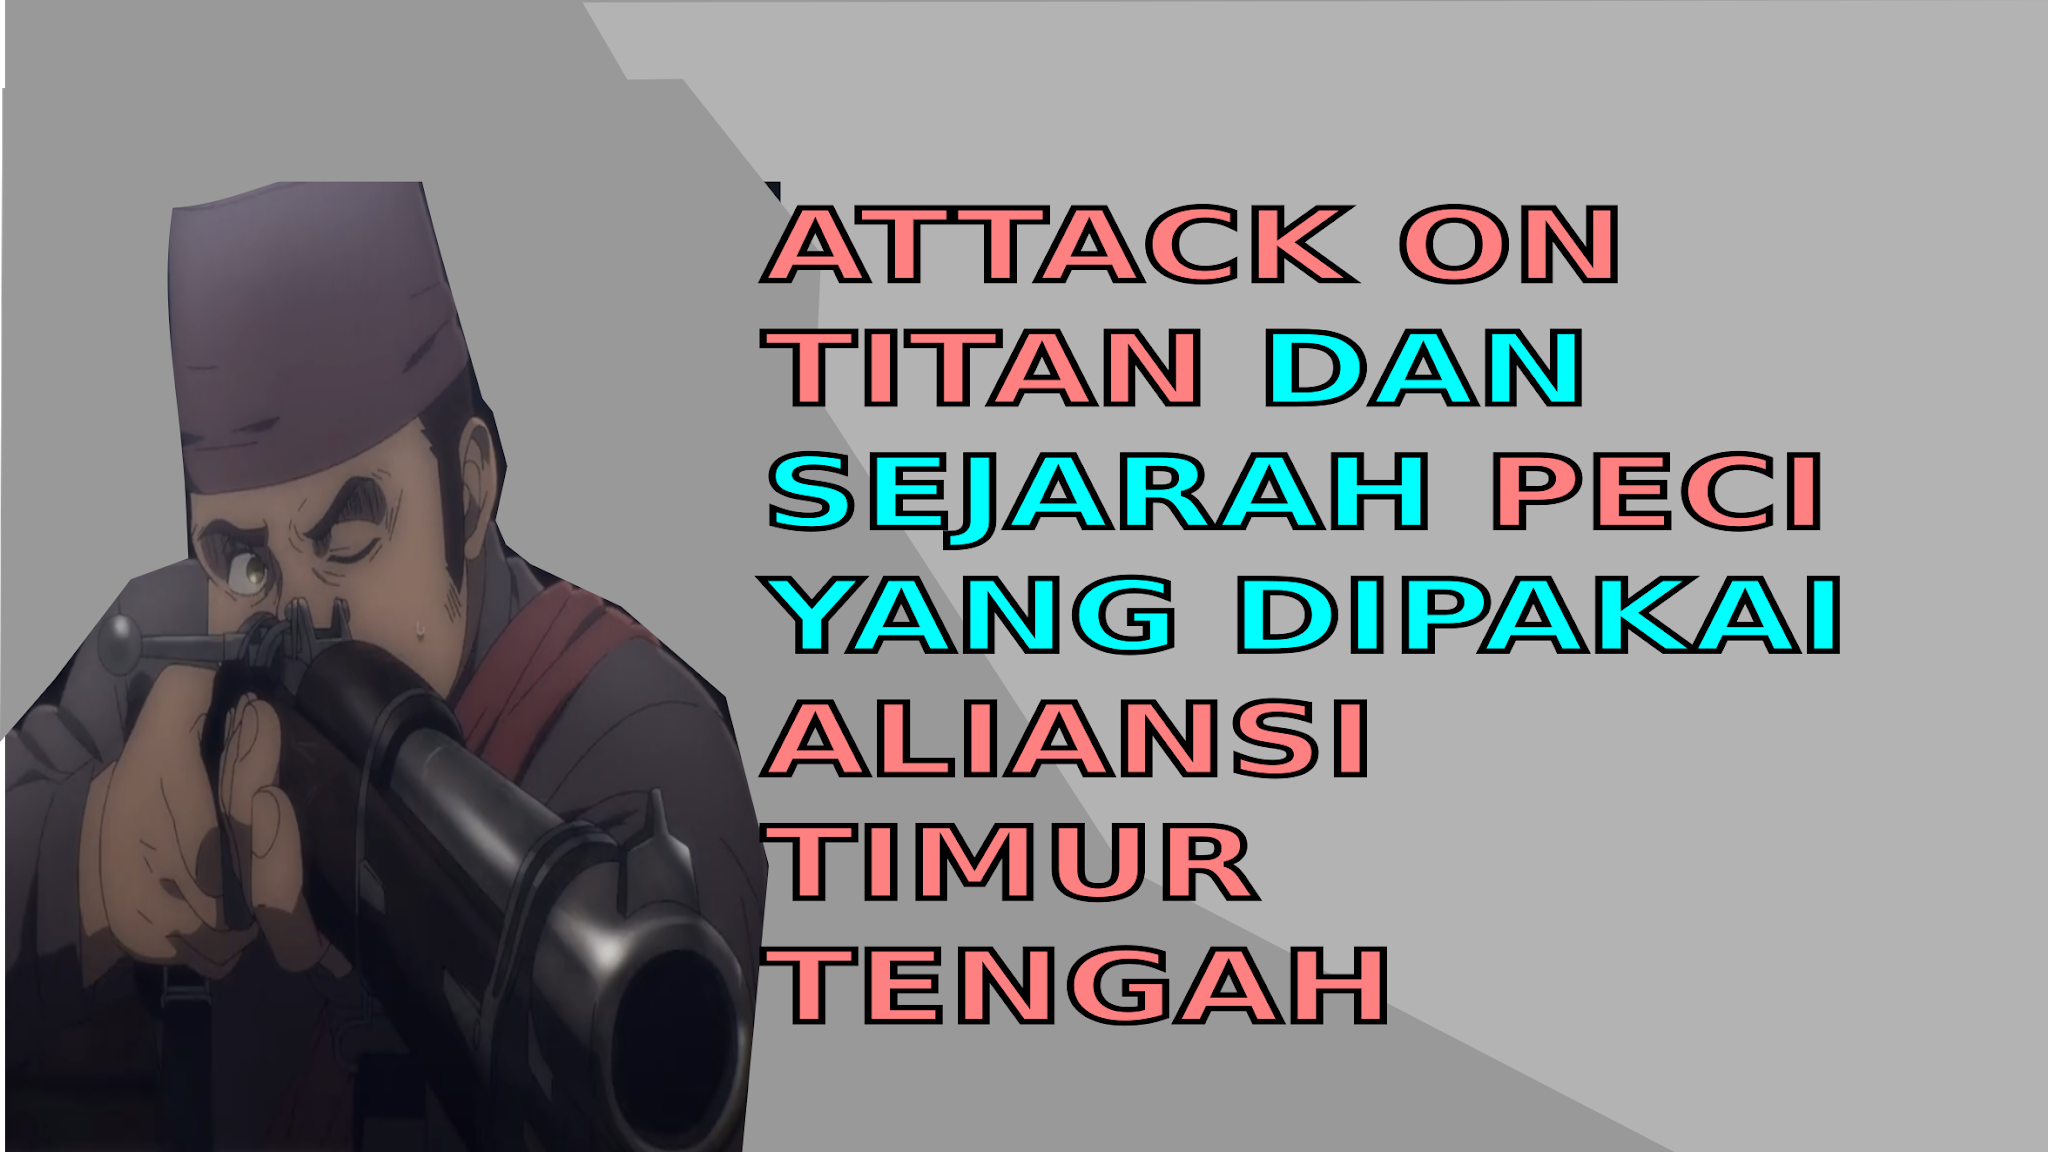 Attack on Titan dan sejarah  peci yang dikenakan oleh aliansi Timur Tengah